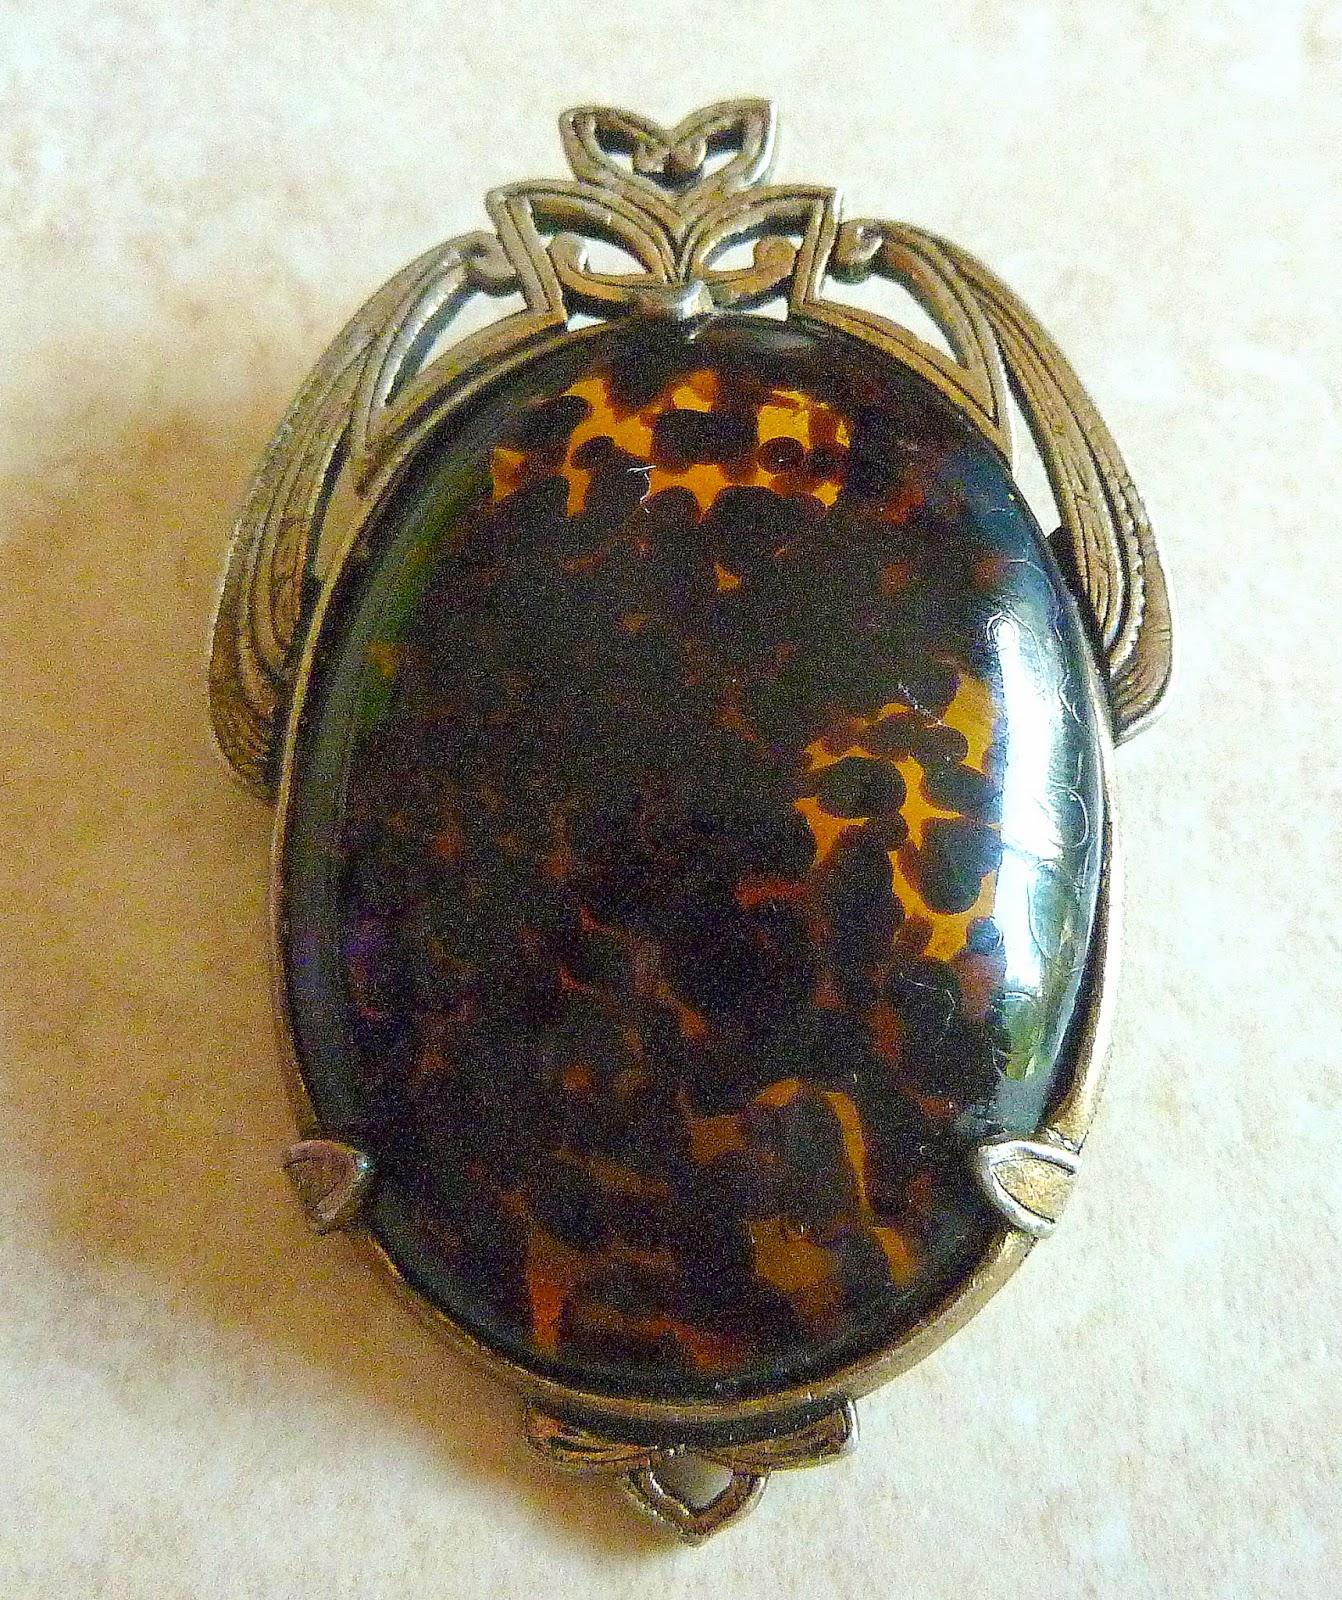 http://www.kcavintagegems.uk/vintage-large-faux-tortoiseshell-art-nouveau-style-brooch-by-miracle-411-p.asp